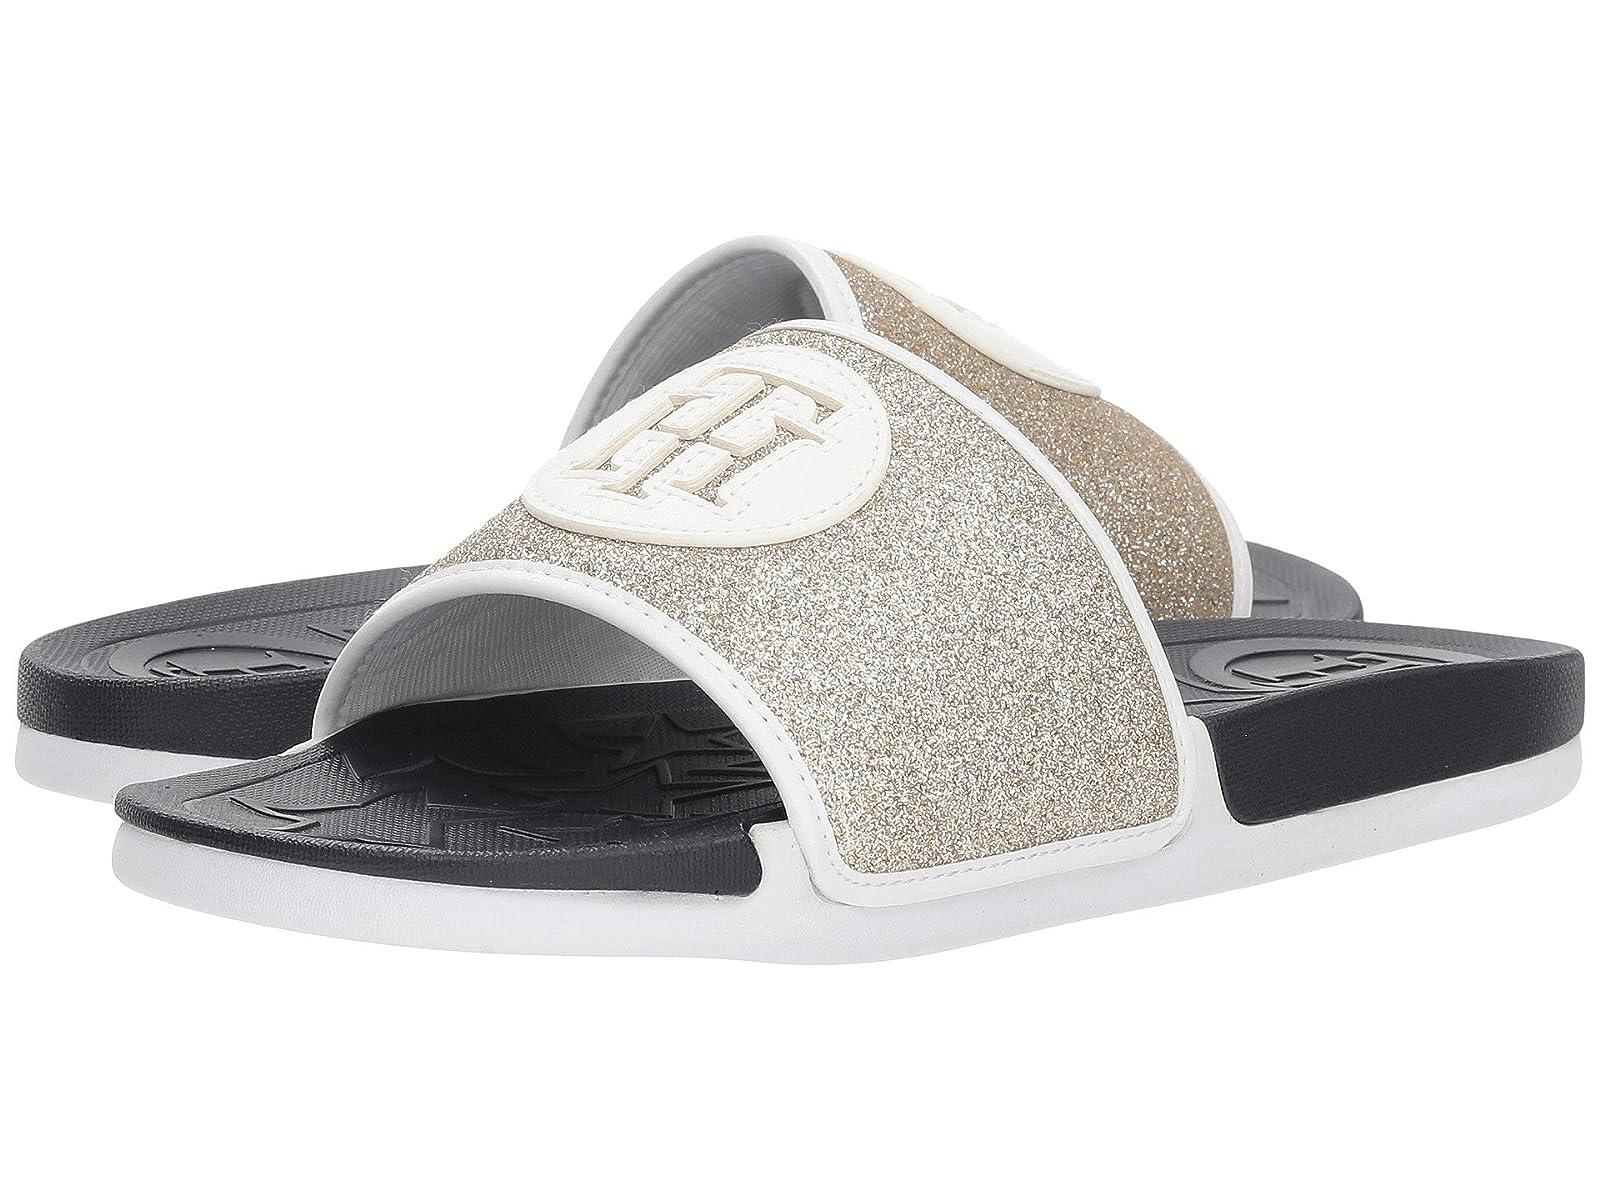 Tommy Hilfiger Yanas2Atmospheric grades have affordable shoes